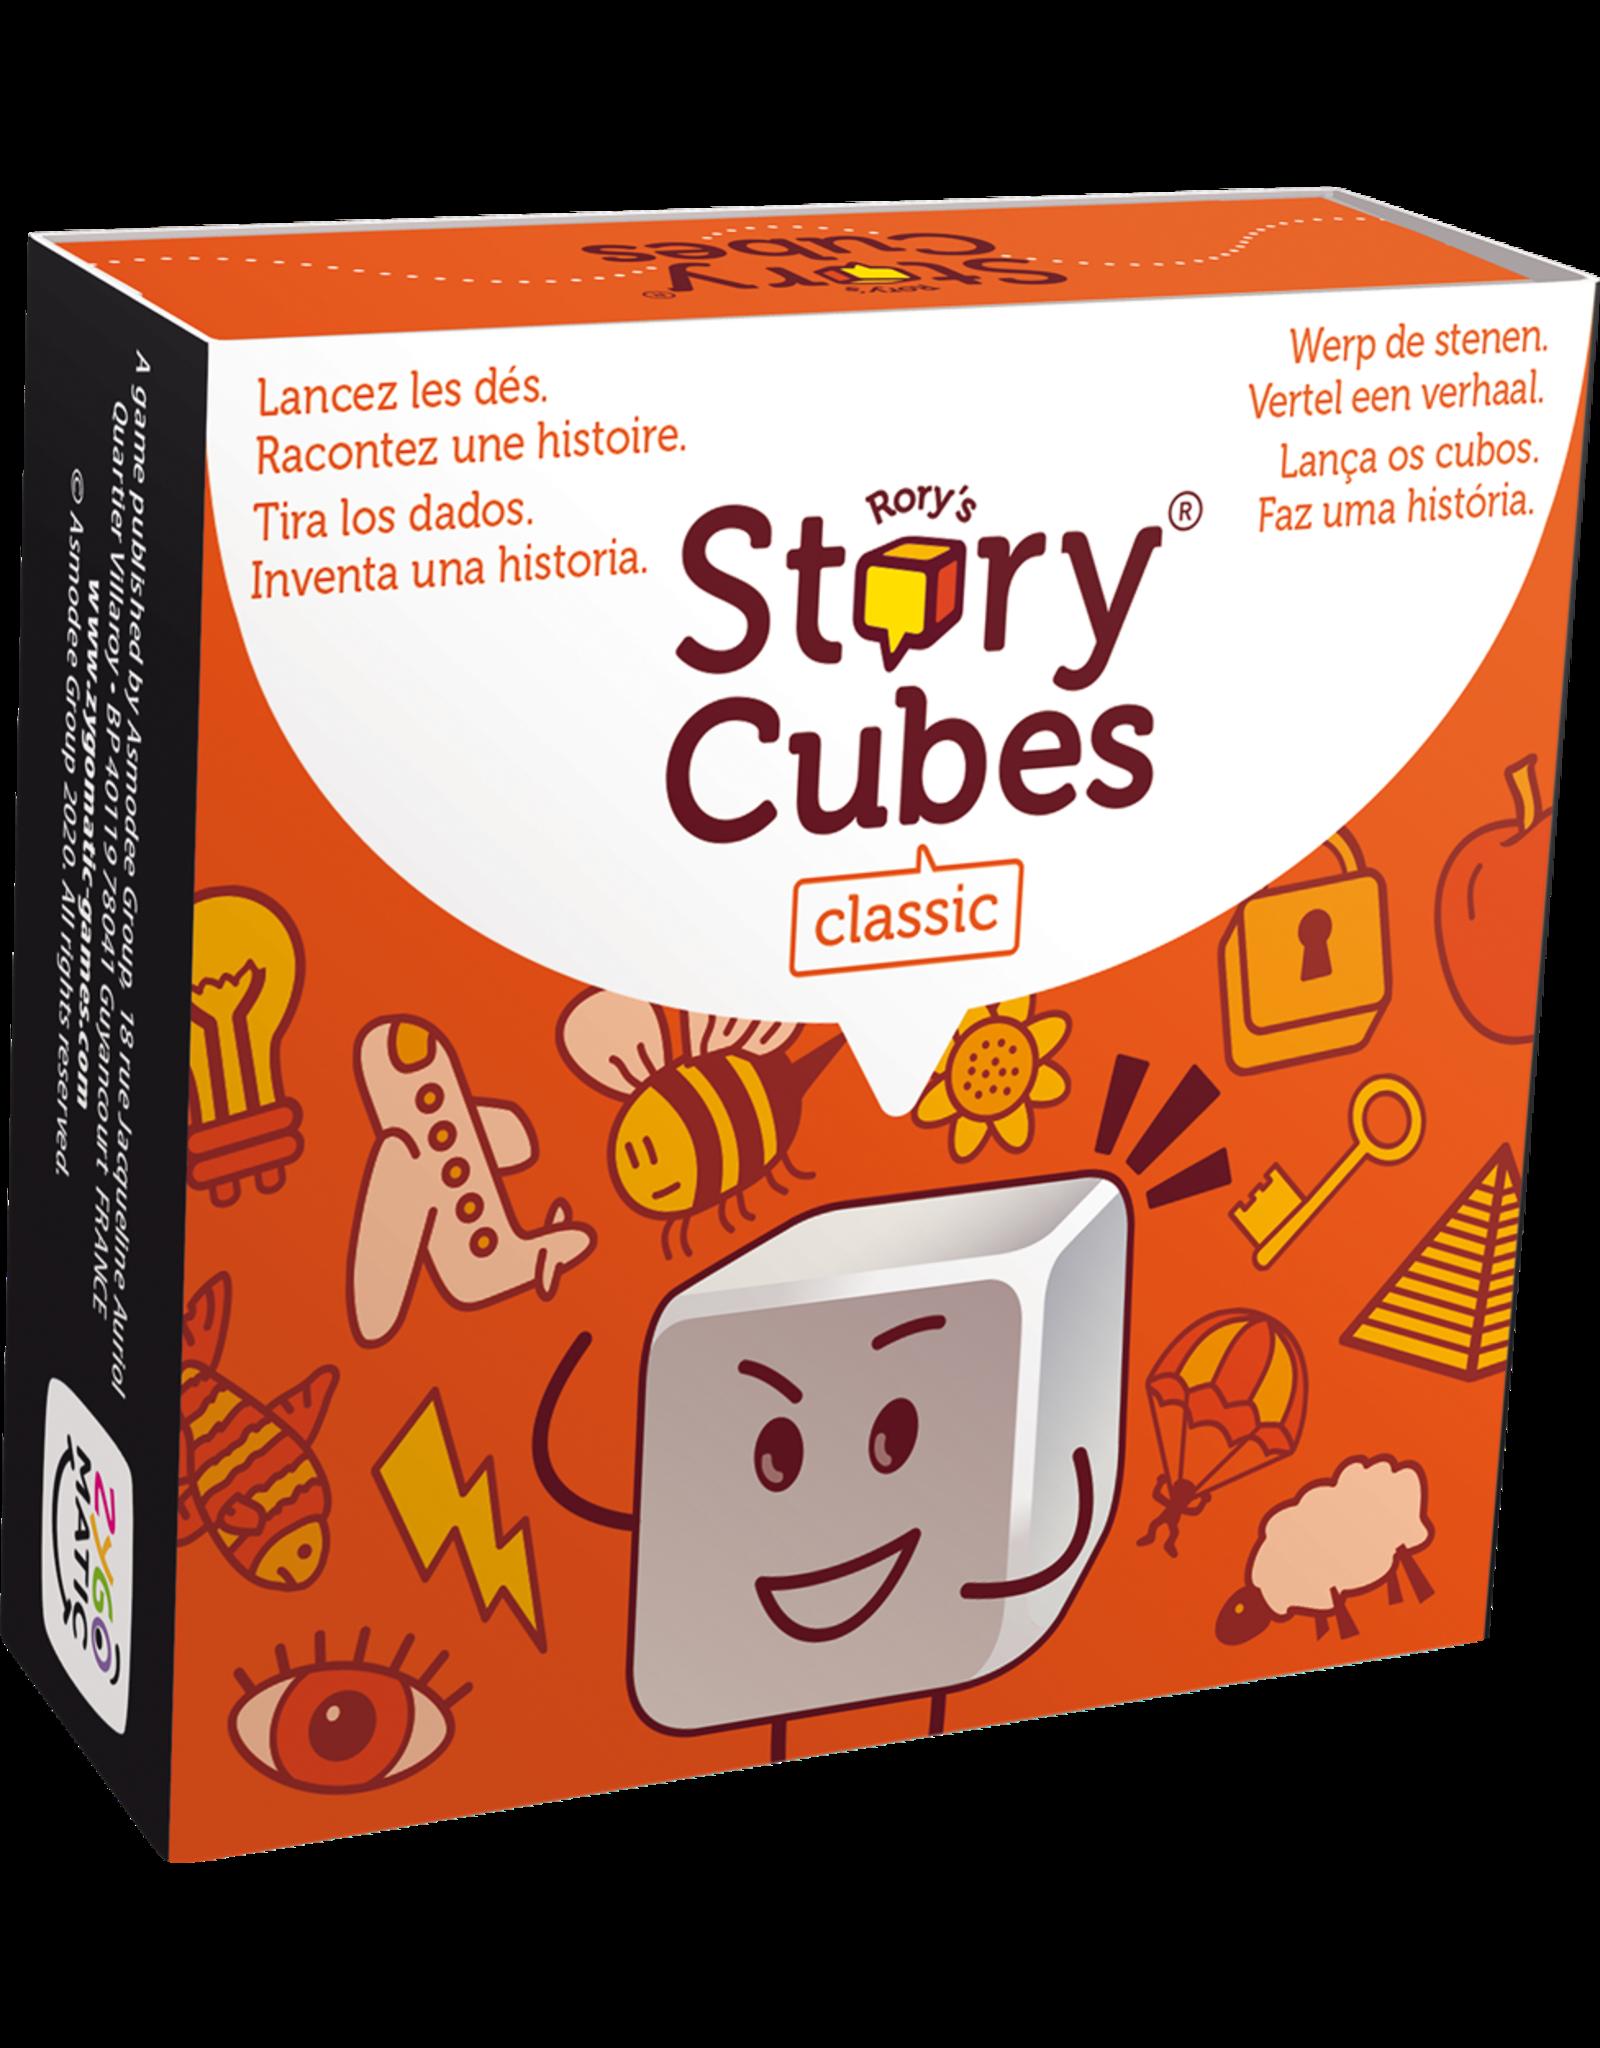 Zygomatic Rory's Story Cubes Original